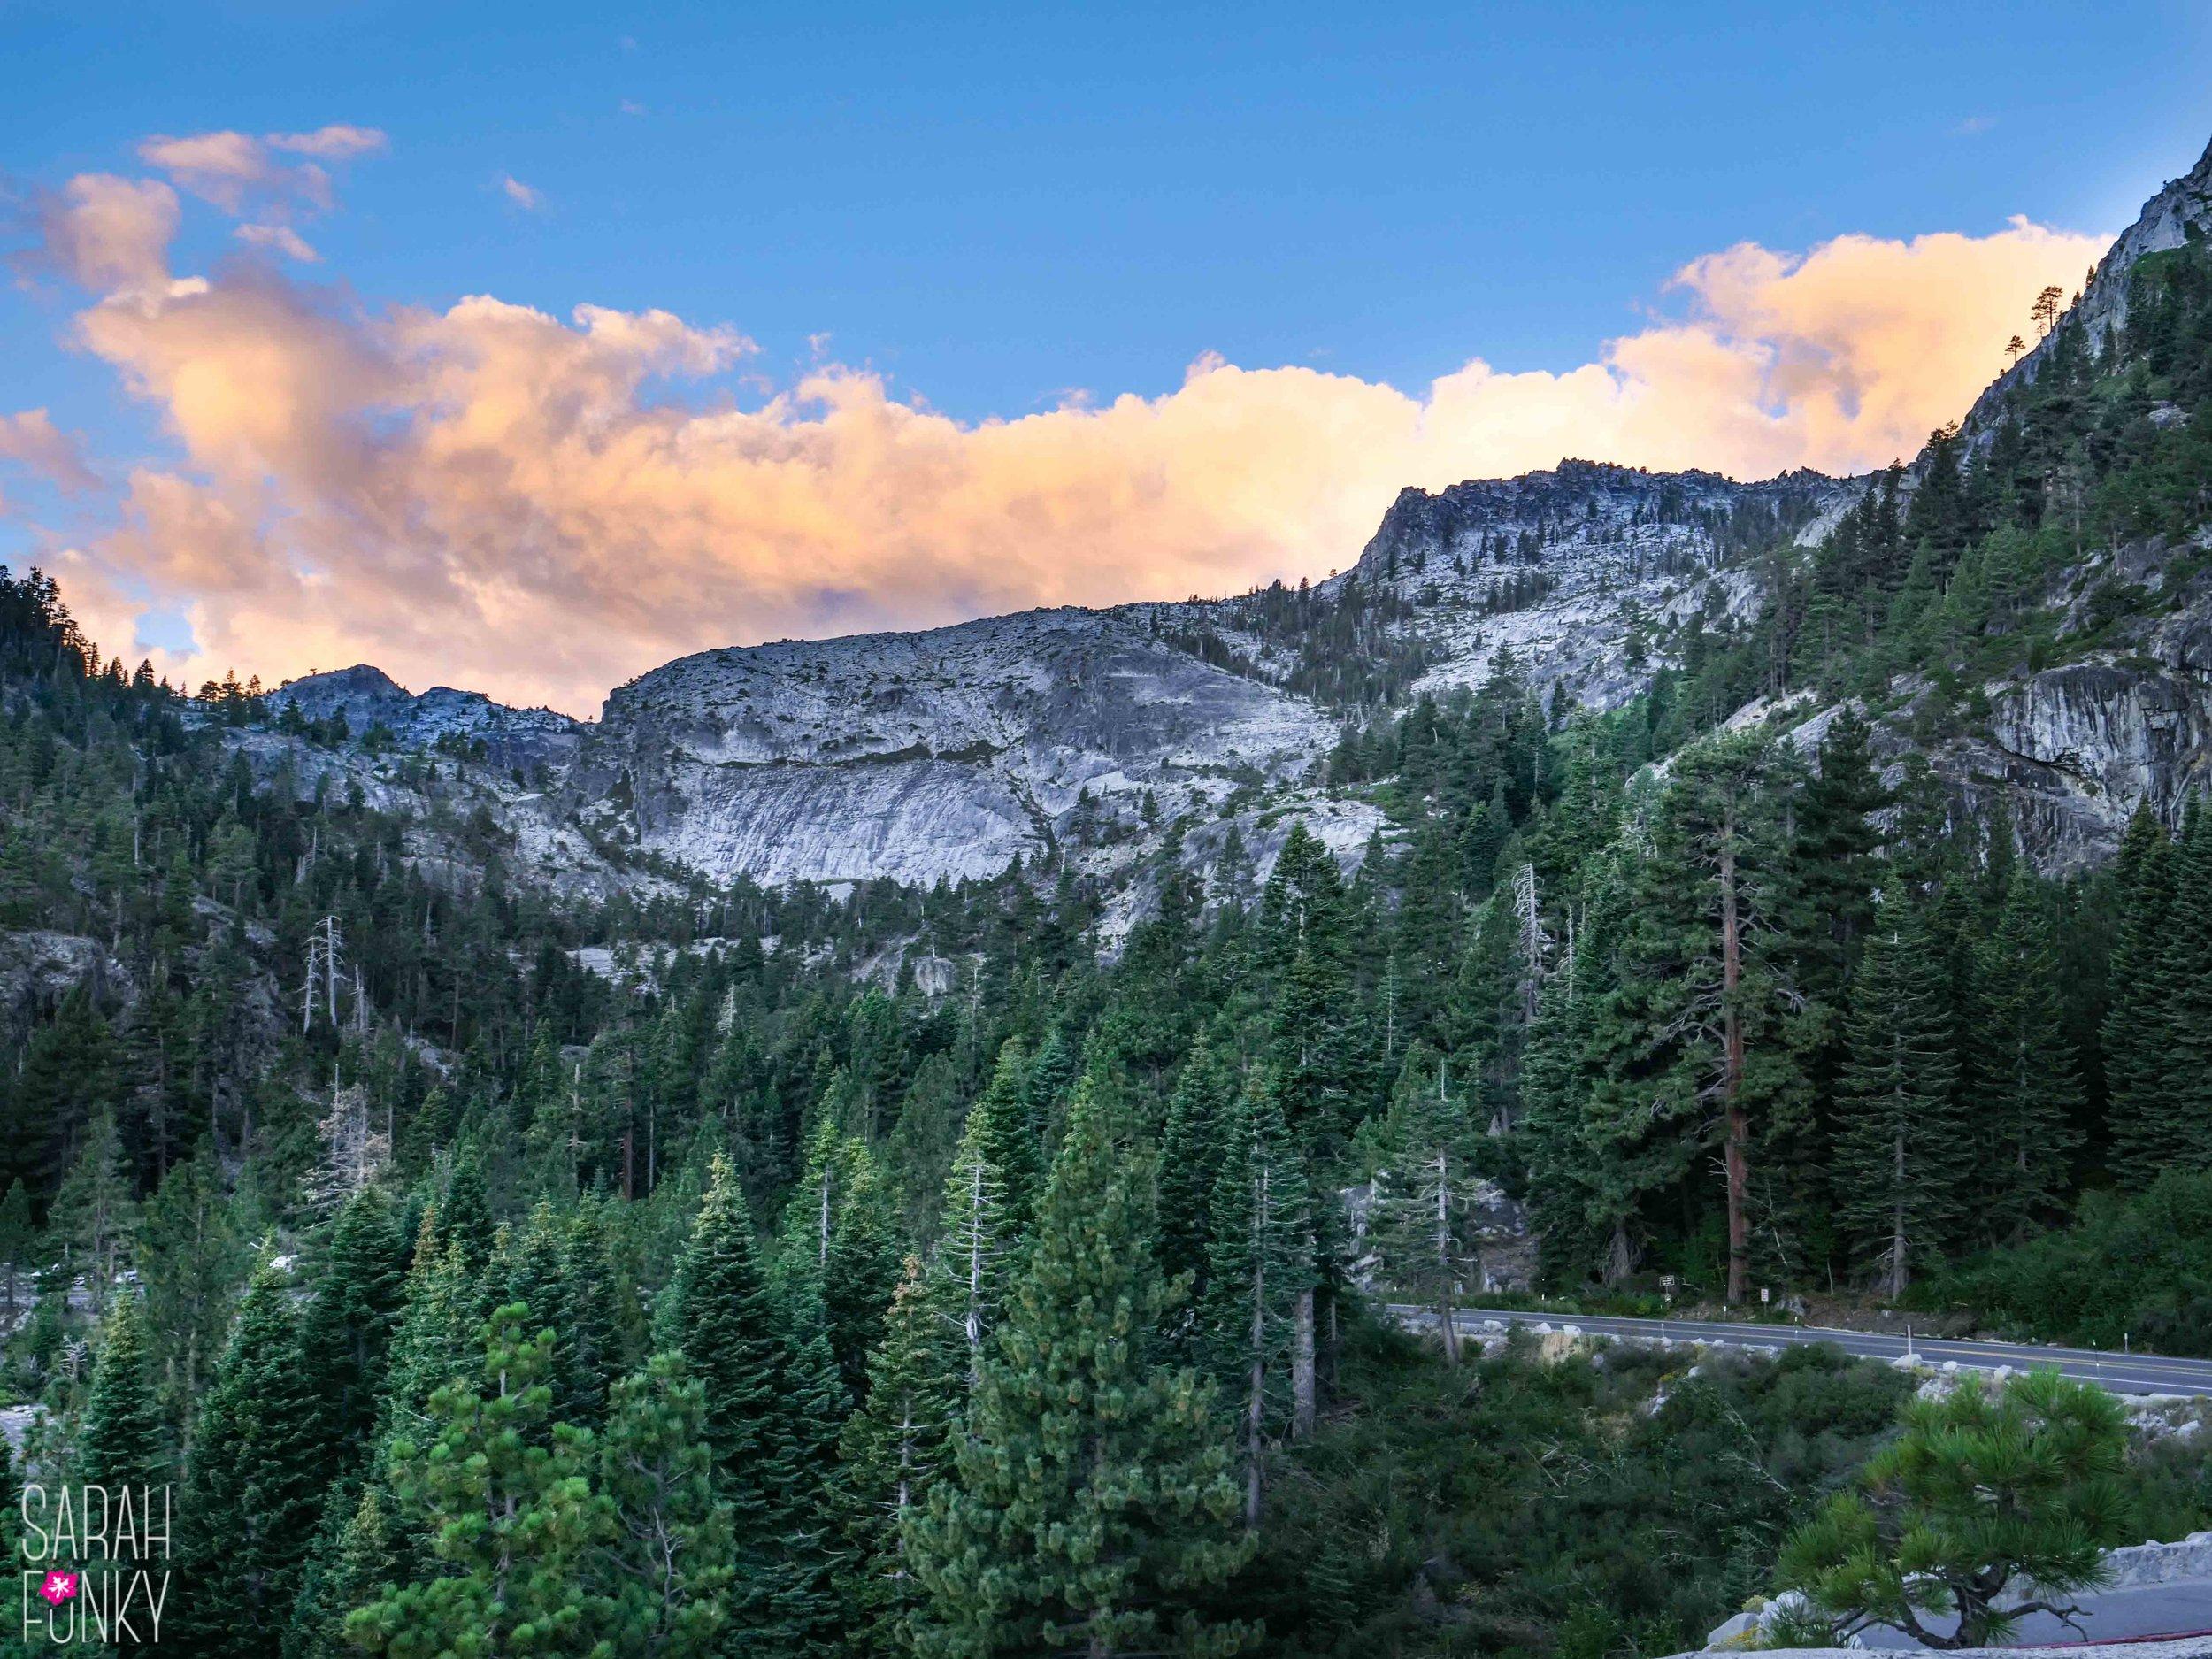 Lake Tahoe Sarahfunky-4.jpg